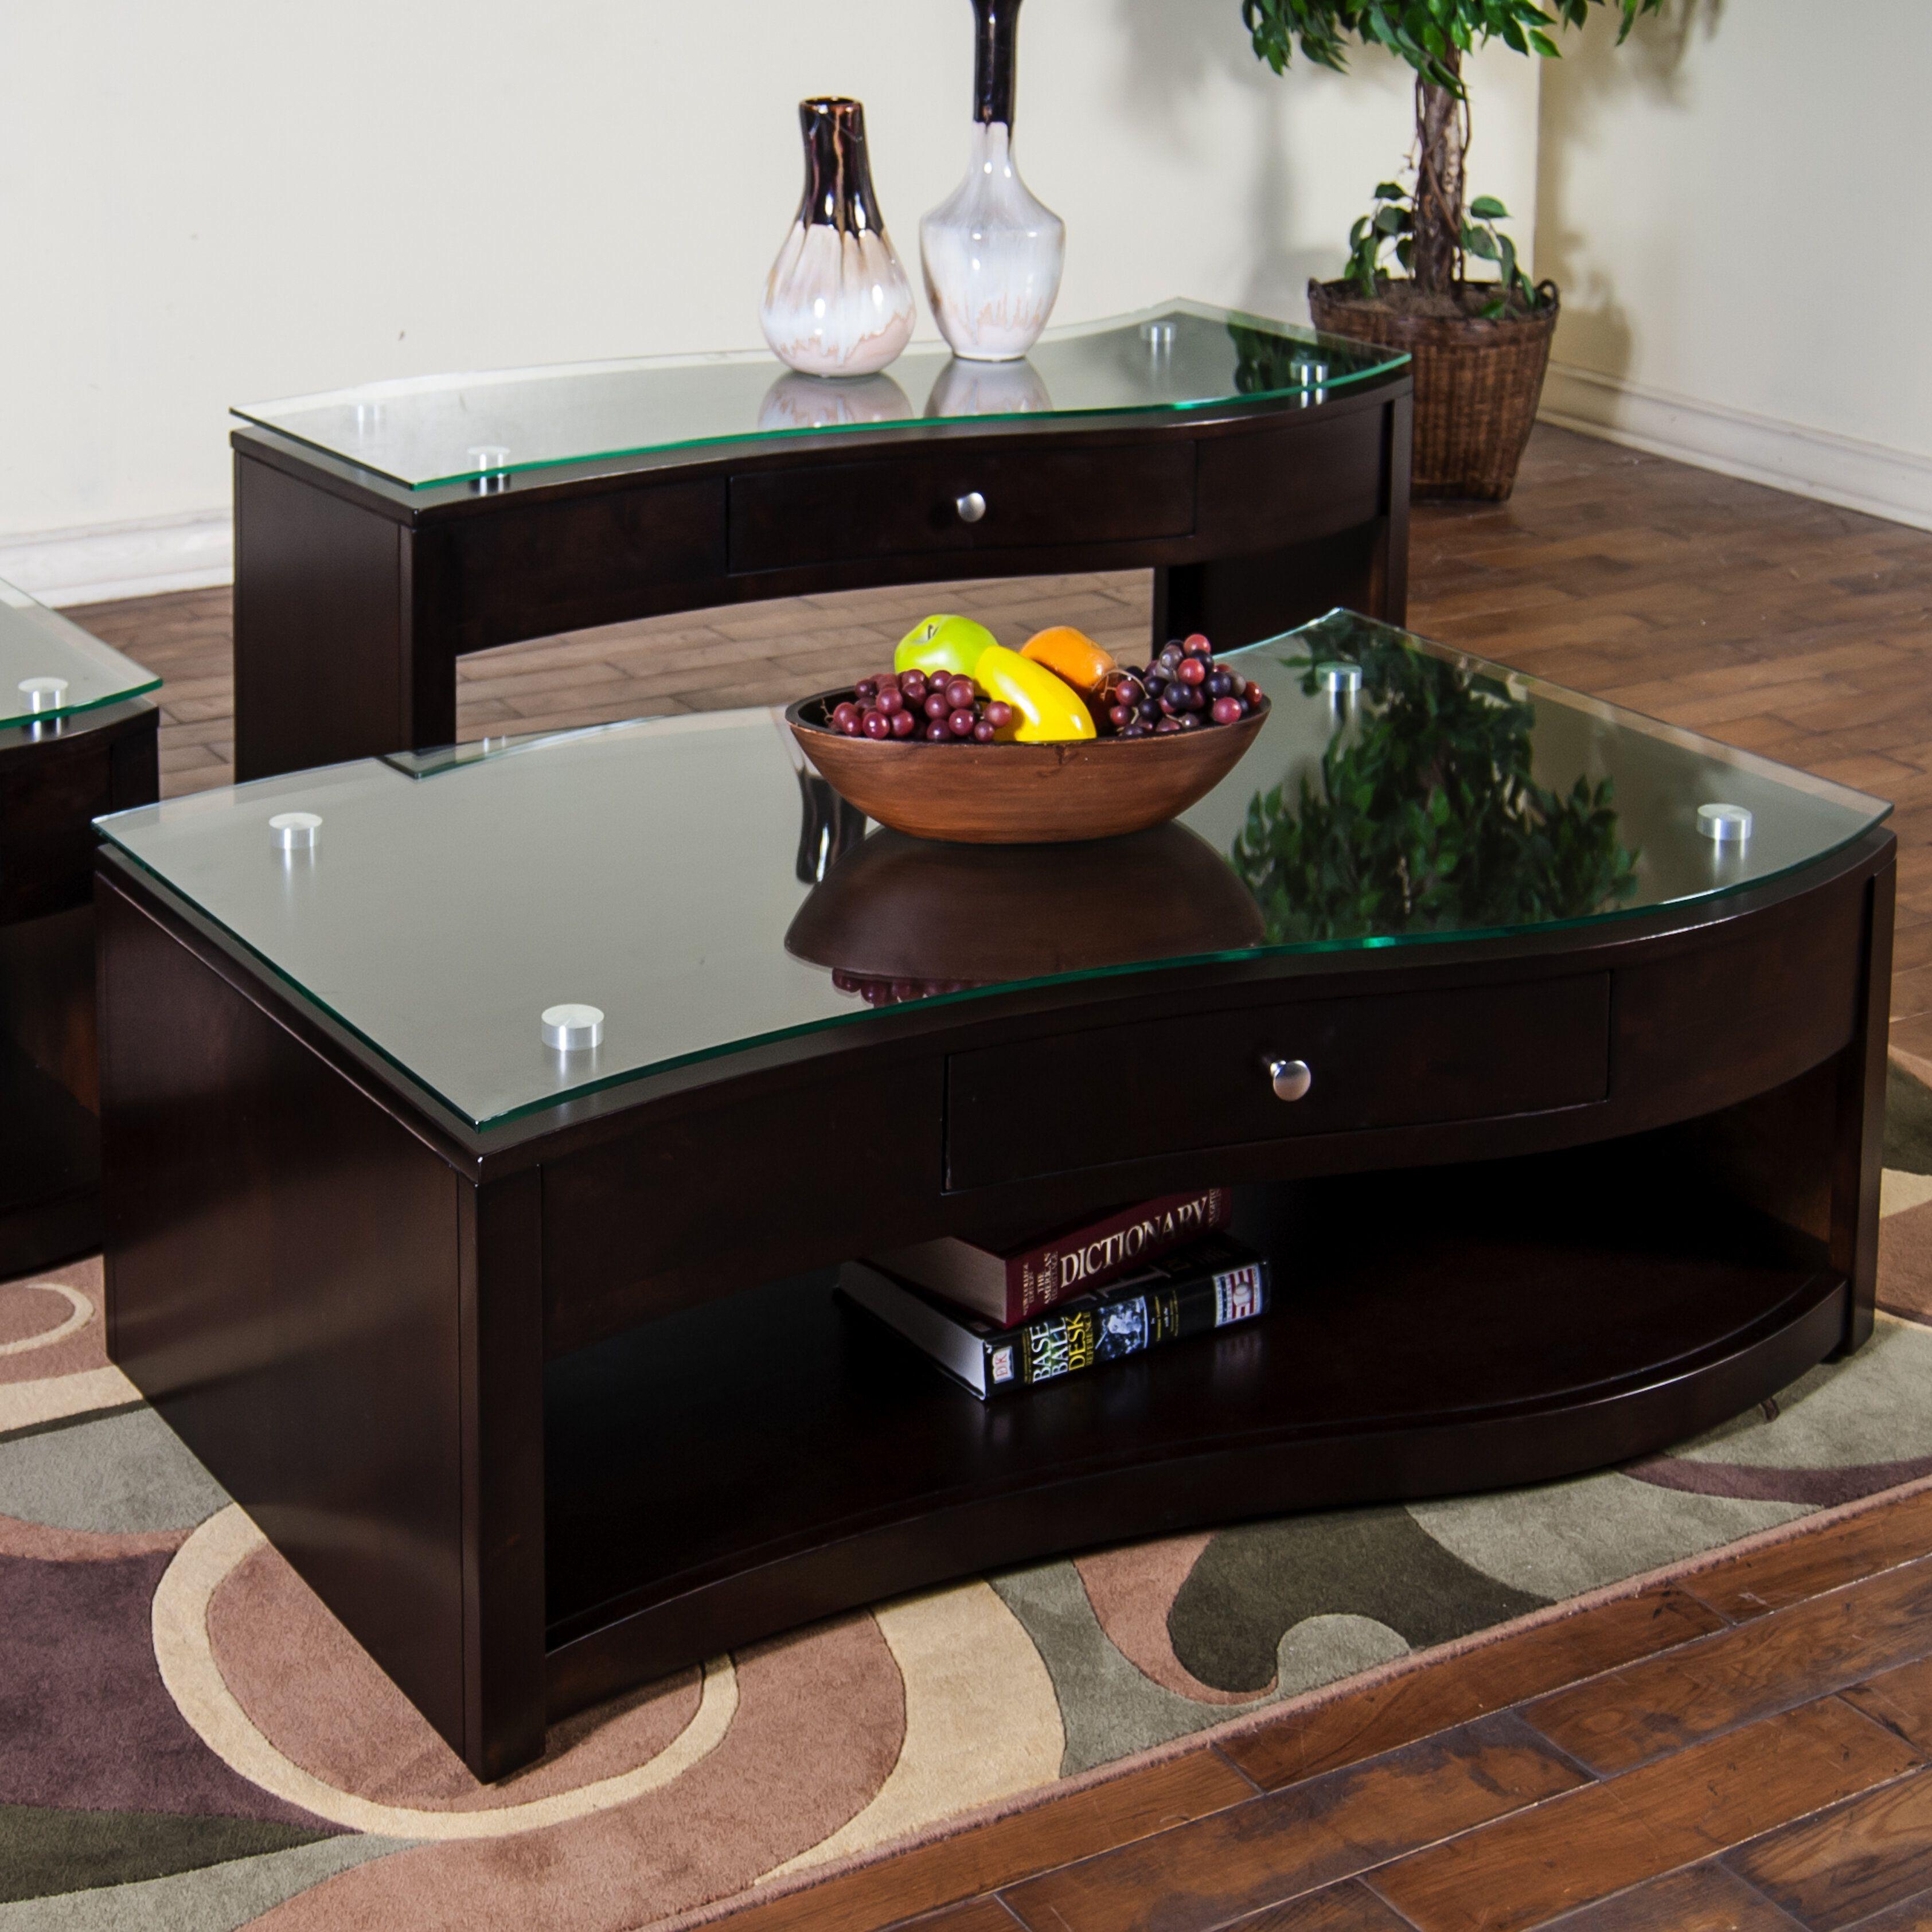 Red Barrel Studio Clegg Coffee Table Wayfair Ca In 2021 Espresso Coffee Table Coffee Table Cool Coffee Tables [ 3369 x 3369 Pixel ]